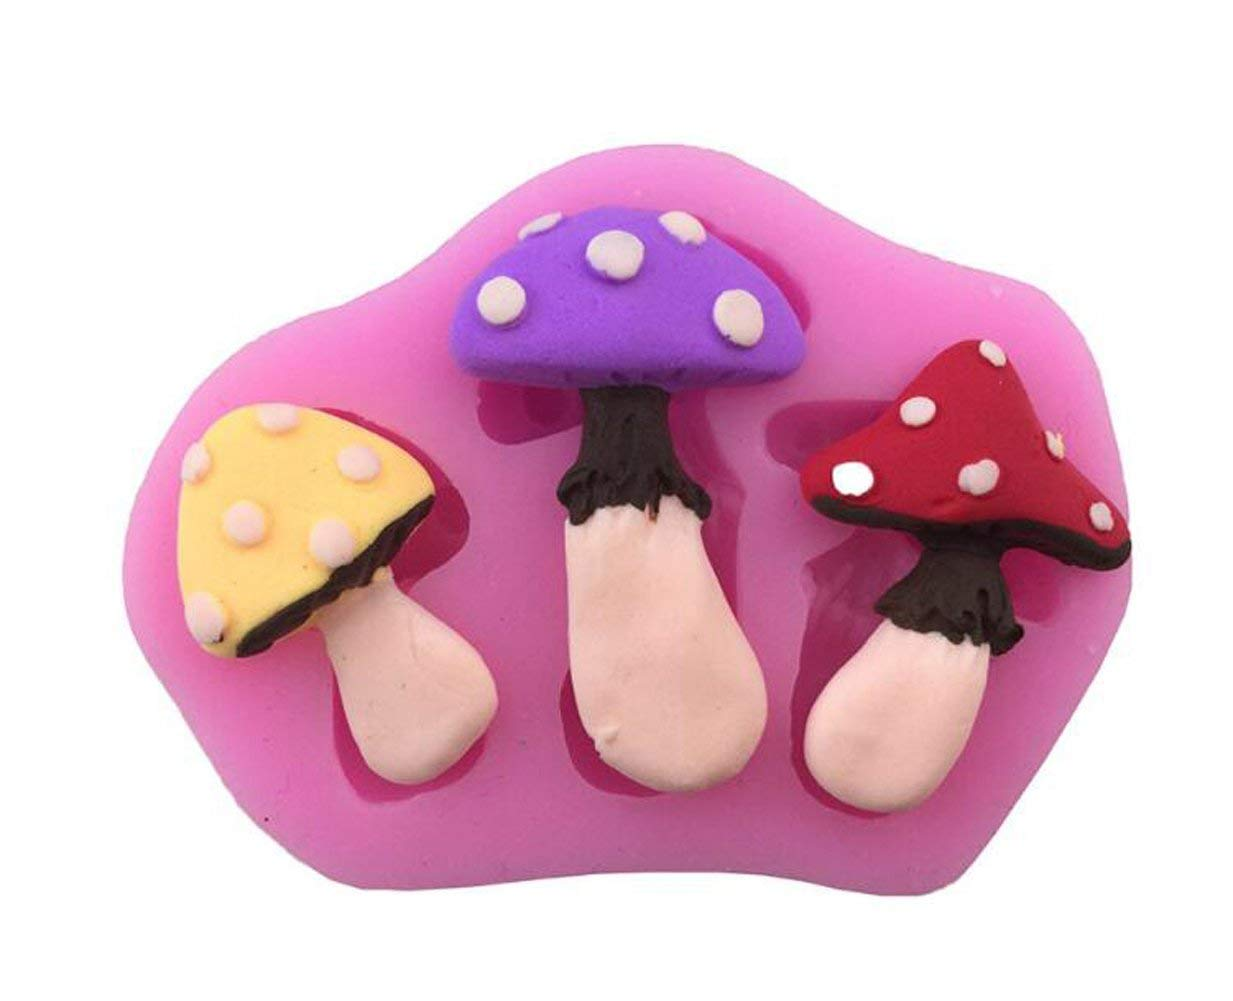 NACOLA Fairy Series 3D Silicone Fondant Cake Chocolate Mold Cake Decoration Baking Tools